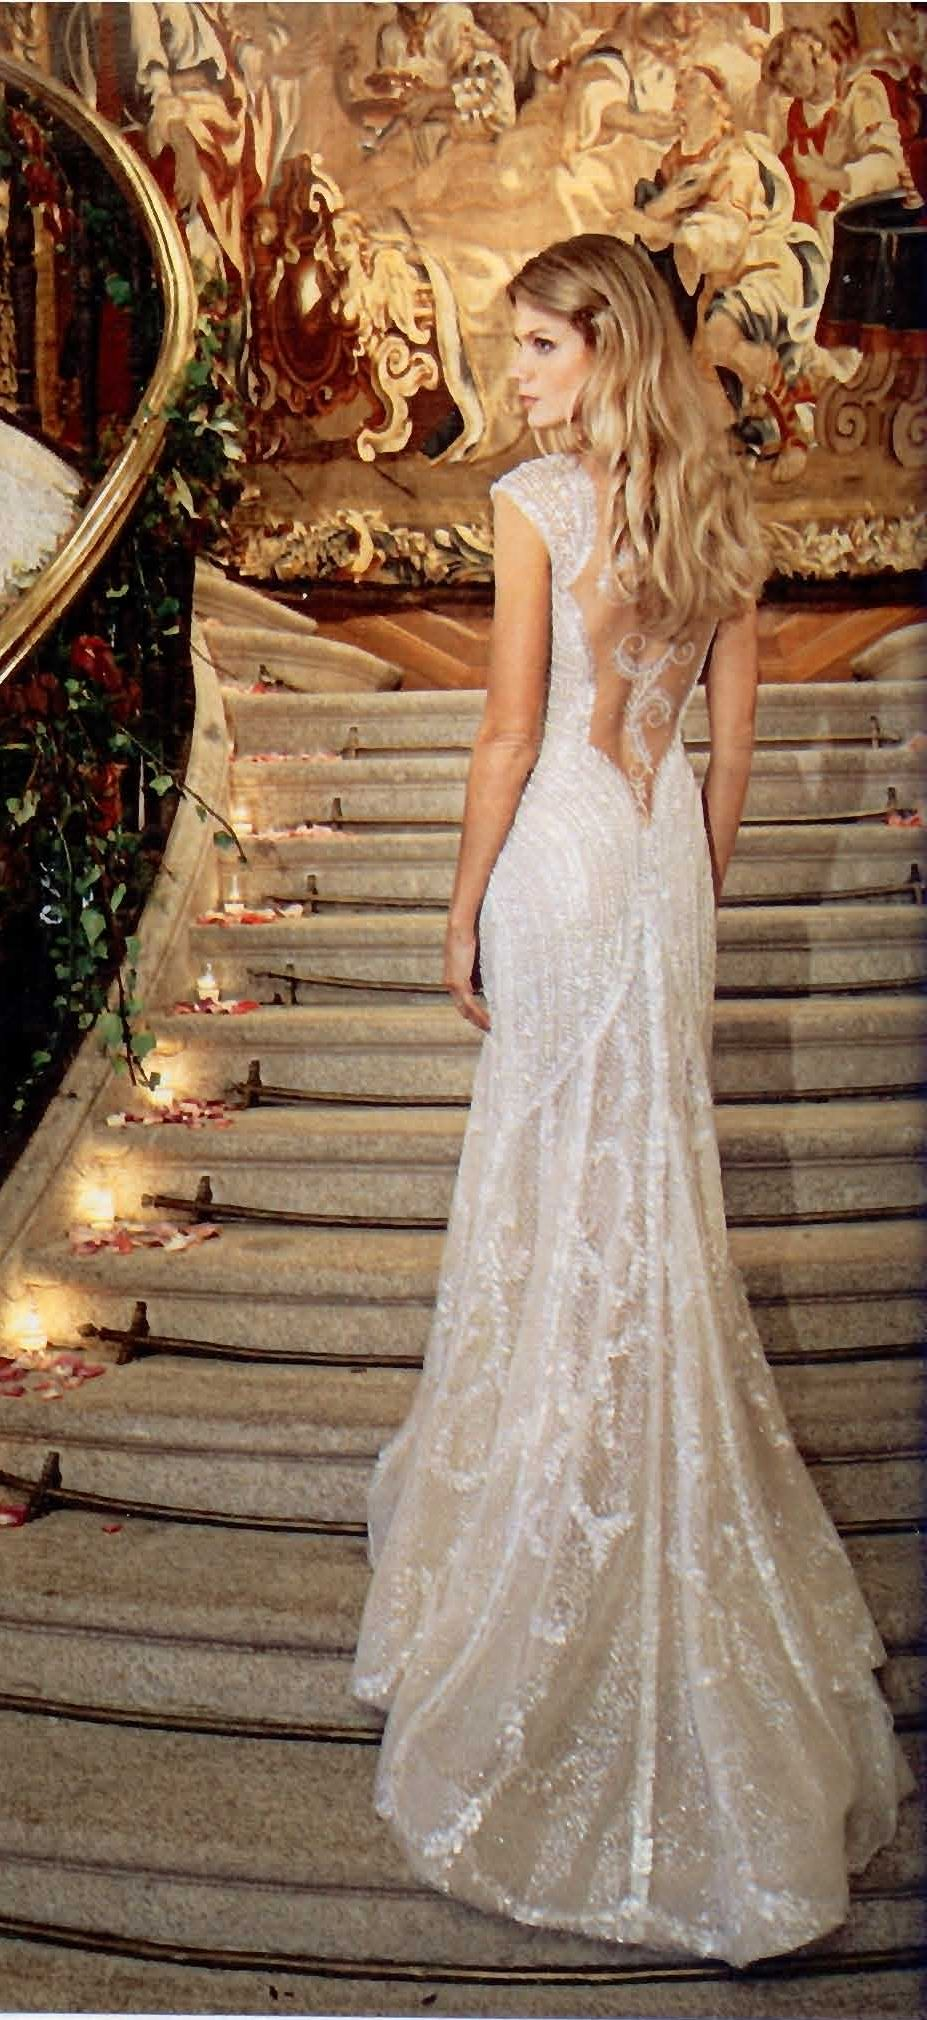 the back of the wow dress   el dia de tu boda   Pinterest   Julio ...